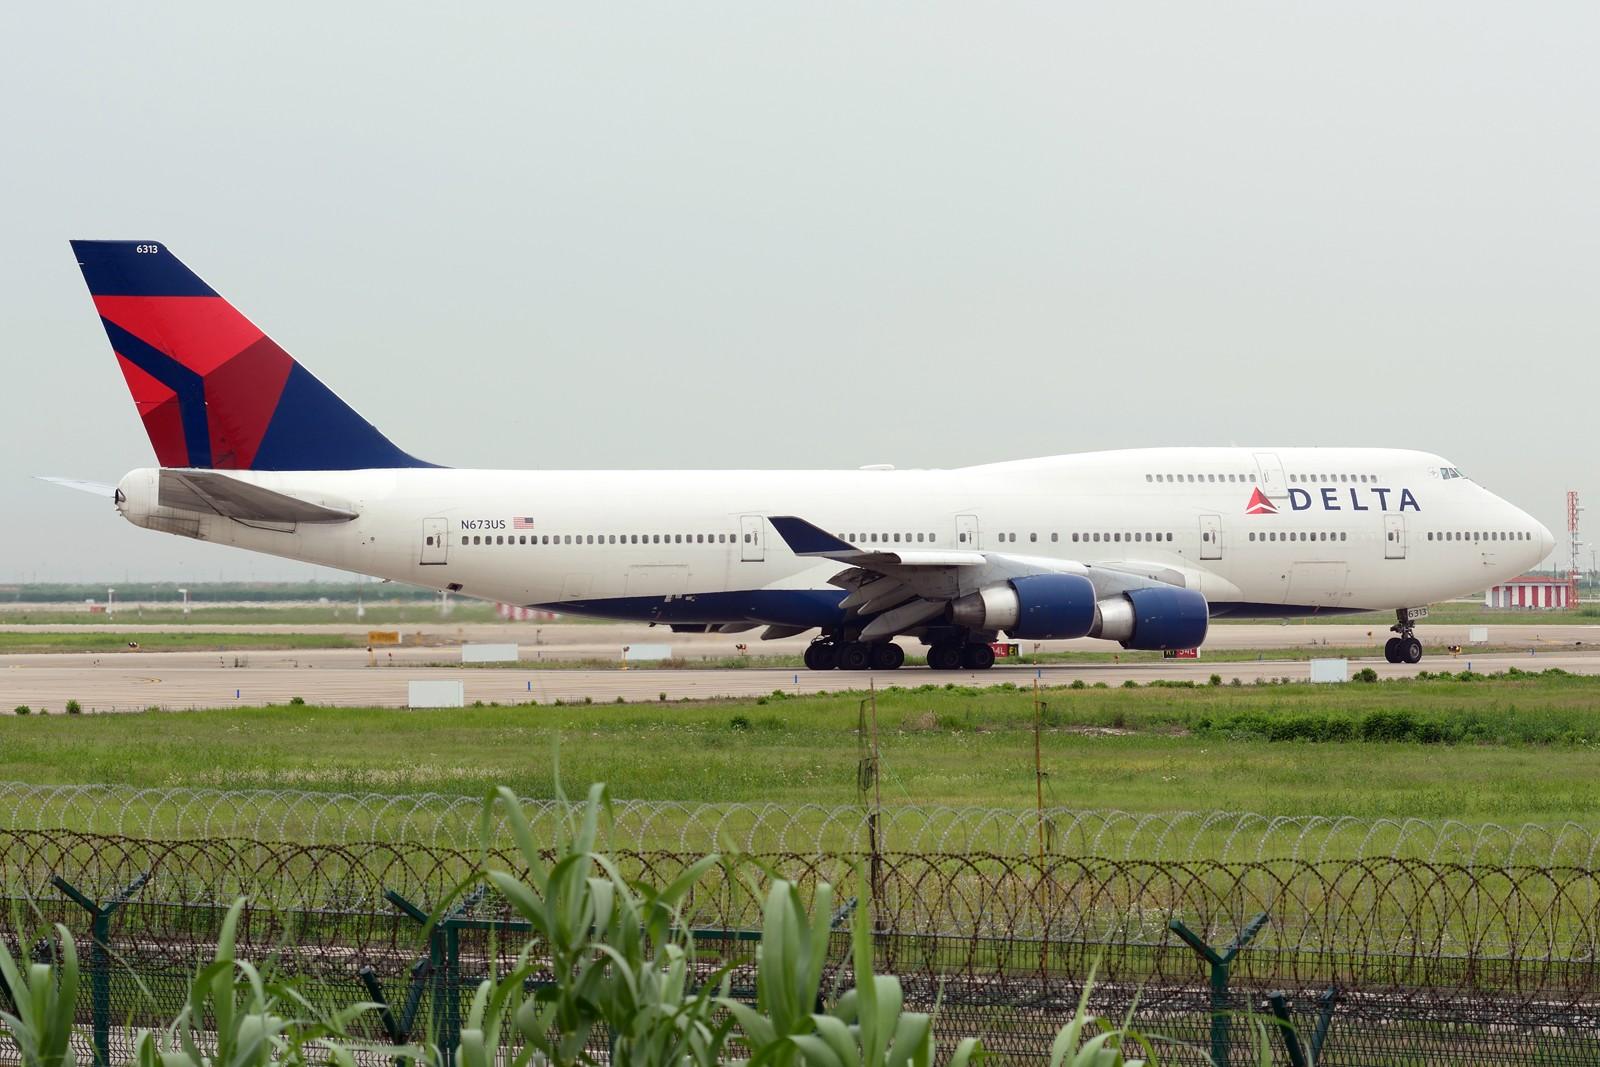 Re:[原创]【上海飞友会】图会很多,也有很多驾驶舱,杂七杂八的美帝,梦寐以求的圣马丁,这更绝不弃贴【驾驶舱已出现】